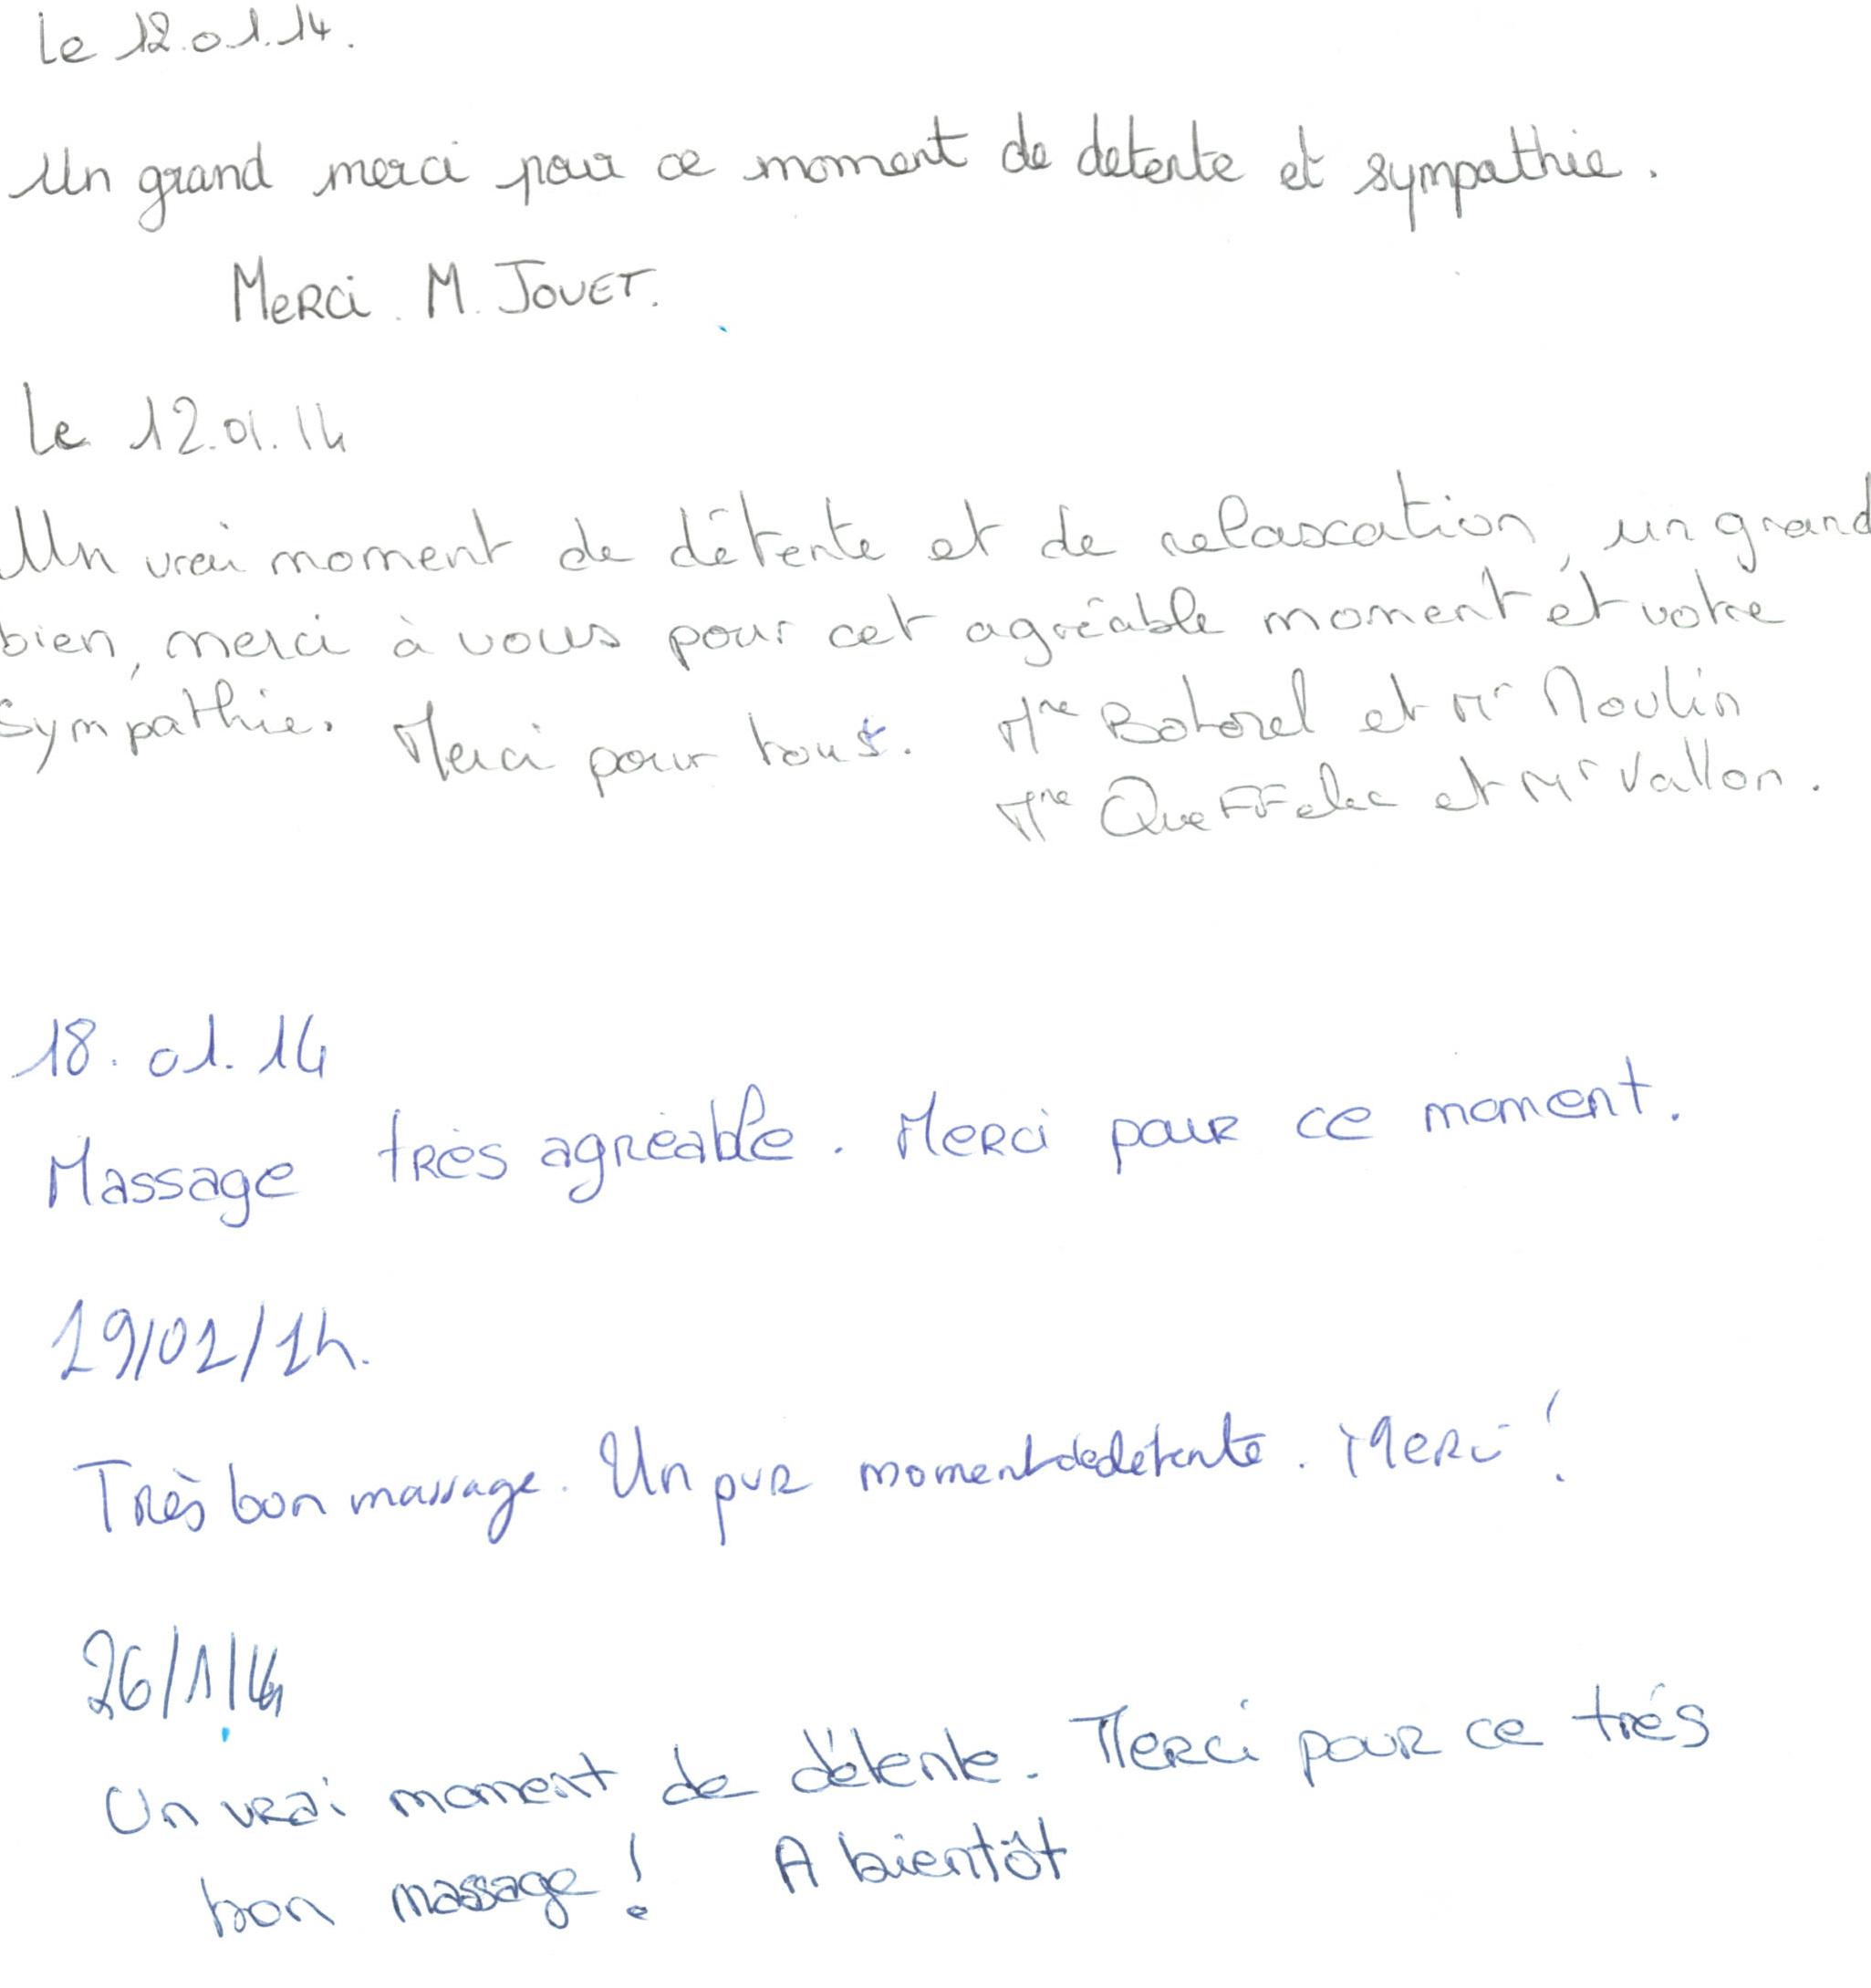 http://www.l-albatros.fr/telechargement/media/cath.jpg